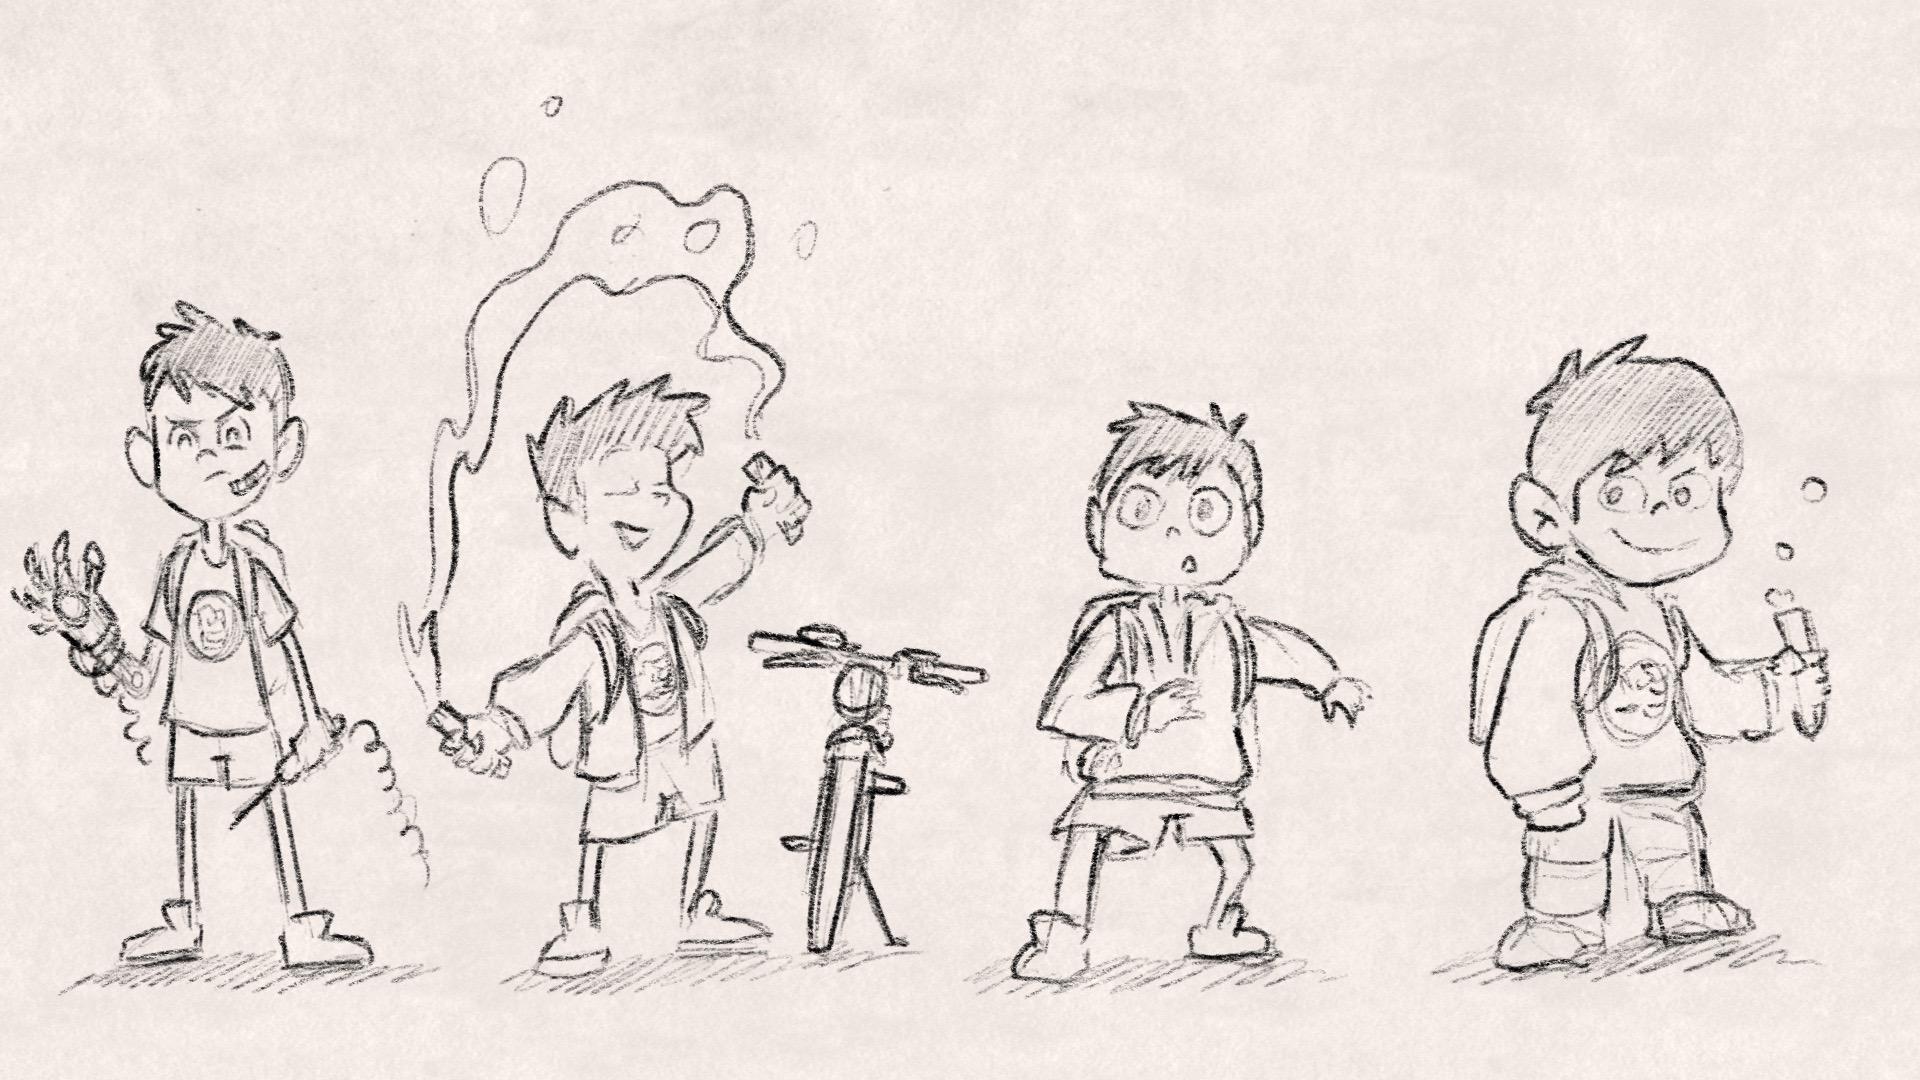 Rough character design sketches at Disney